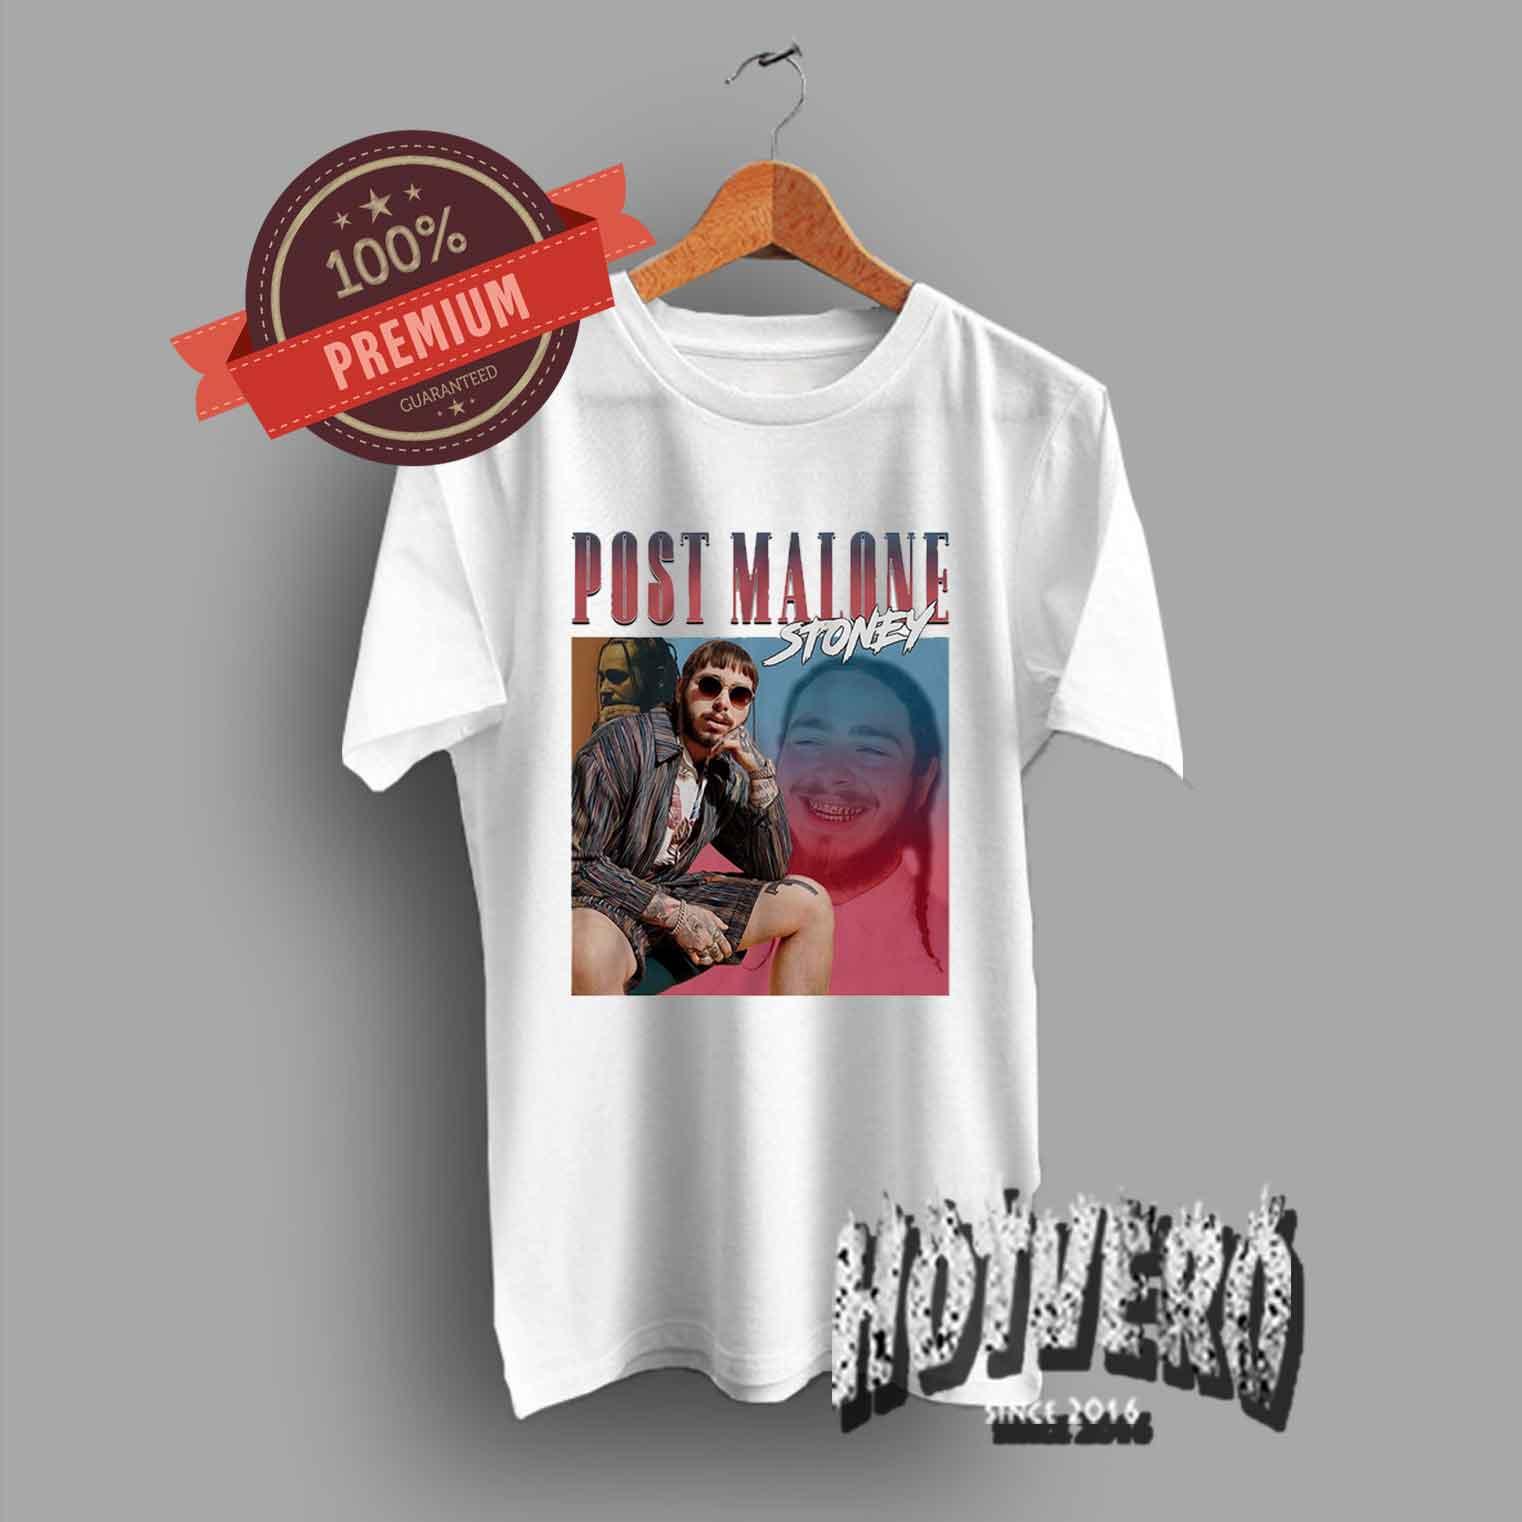 709642047 Post Malone Stoney Tour T Shirt Urban Streetwear